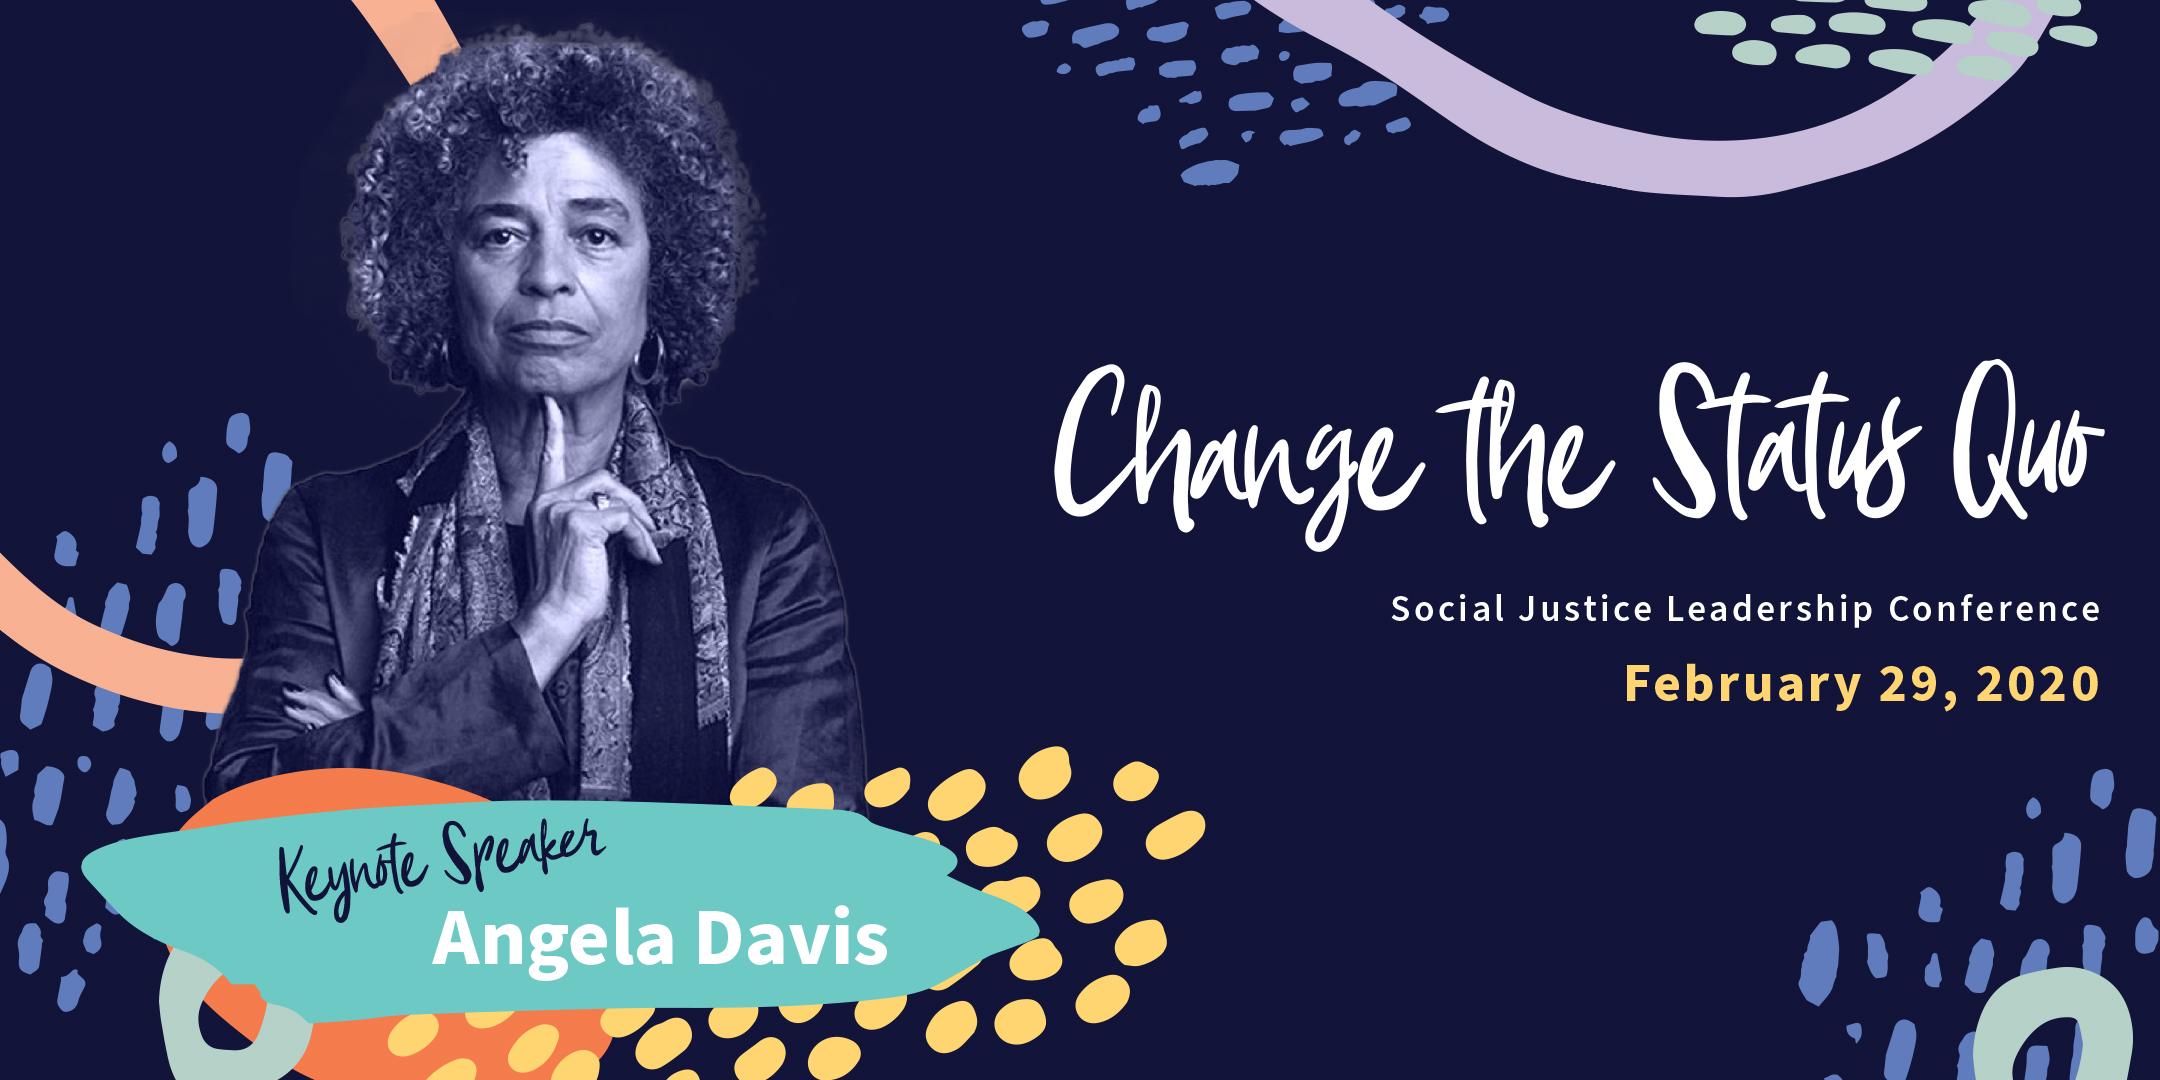 Social Justice Leadership Conference featuring Keynote Speaker Angela Davis